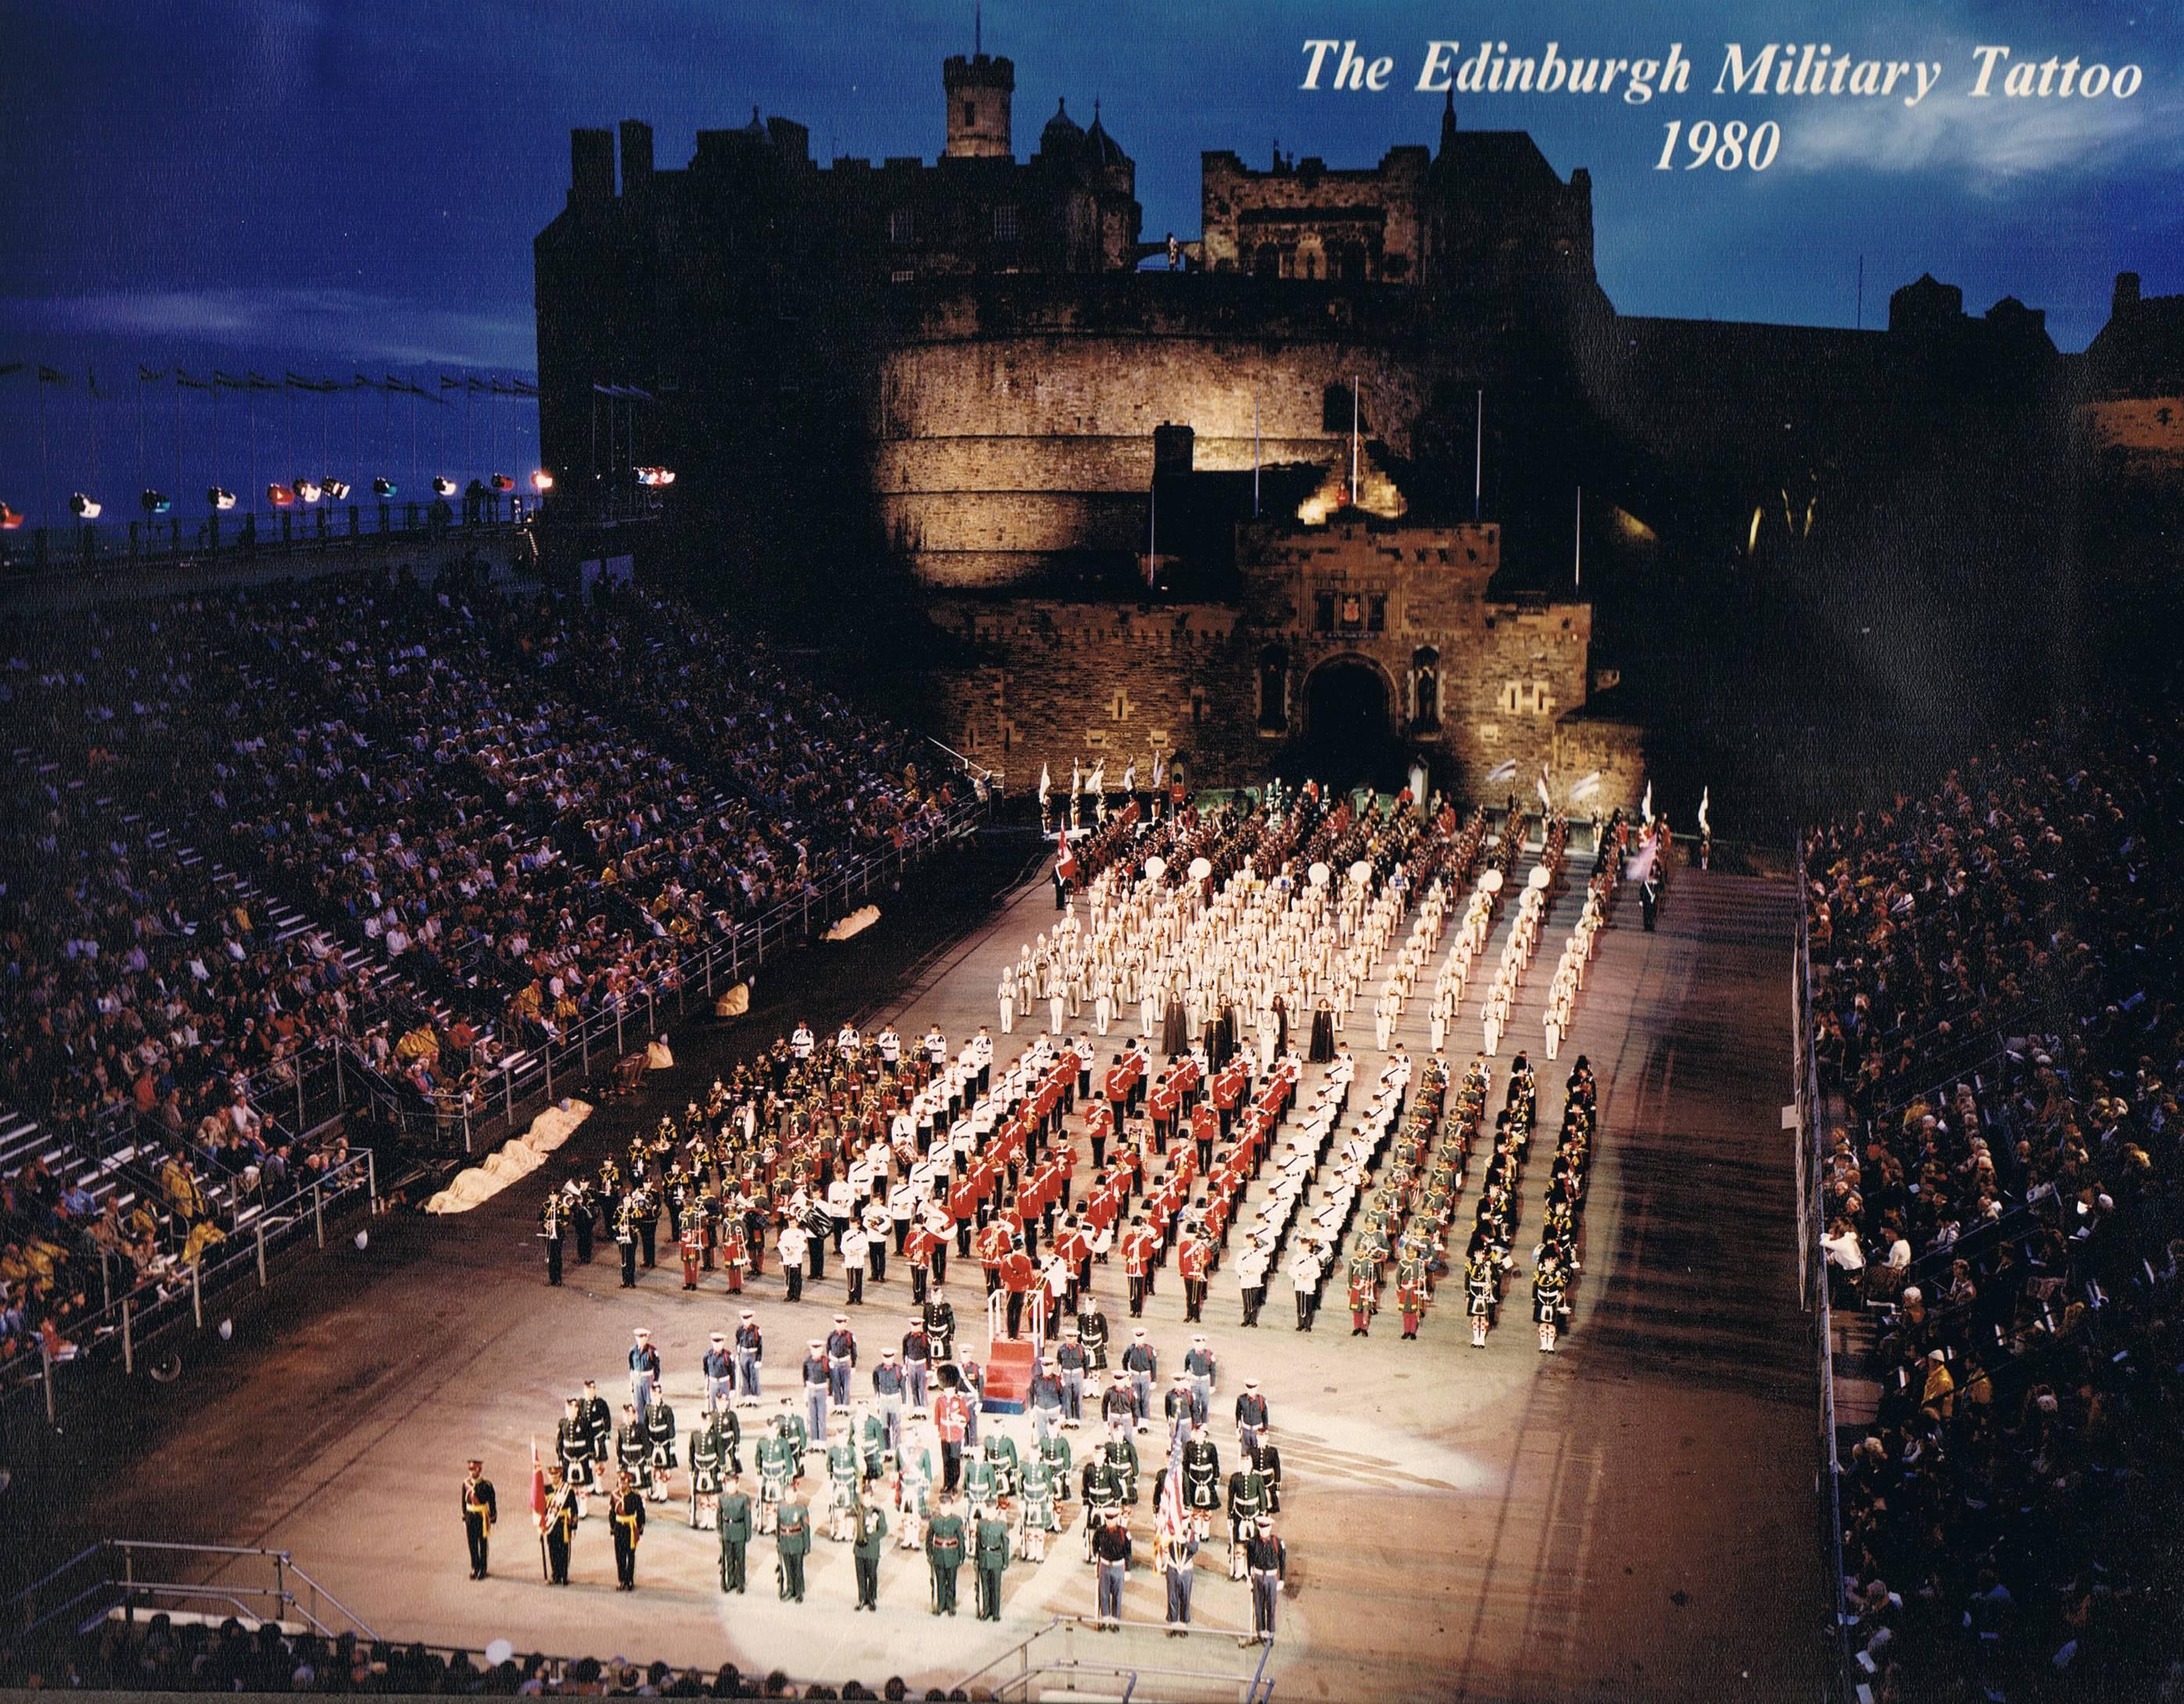 Top edinburgh tattoo 1978 images for pinterest tattoos for Scotland military tattoo